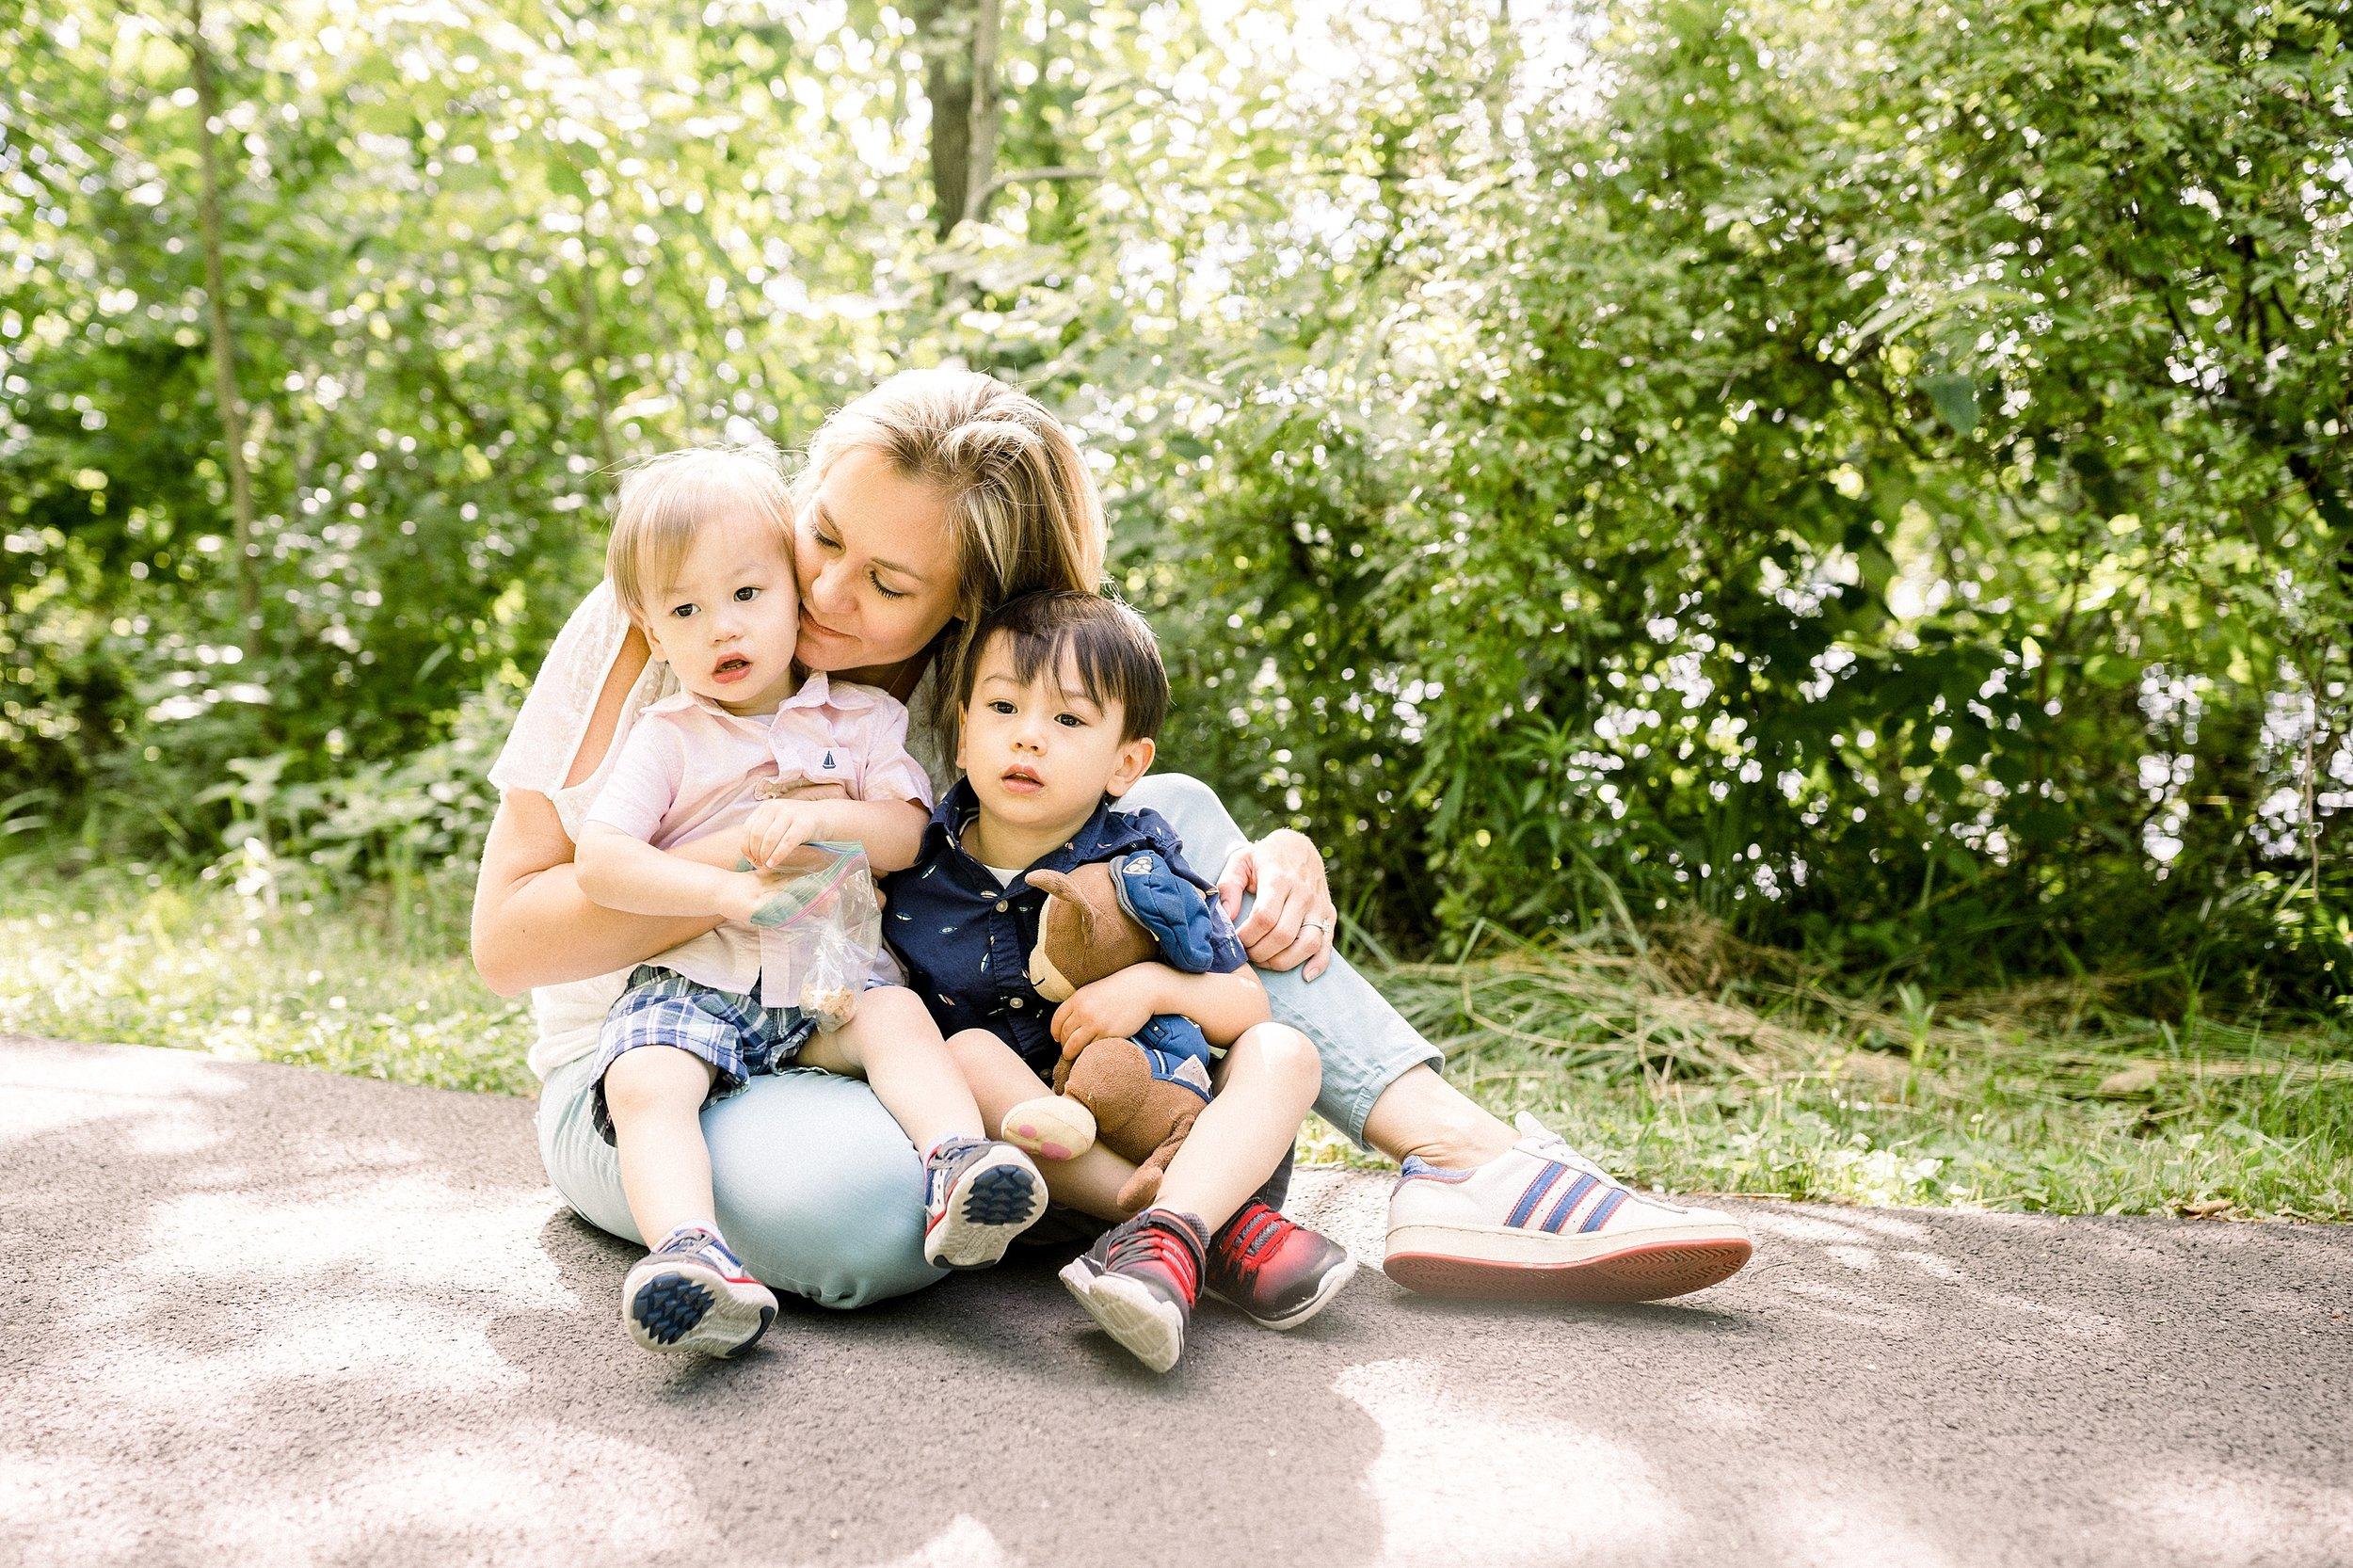 Bucks-County-Family-Photographer_0013-1.jpg